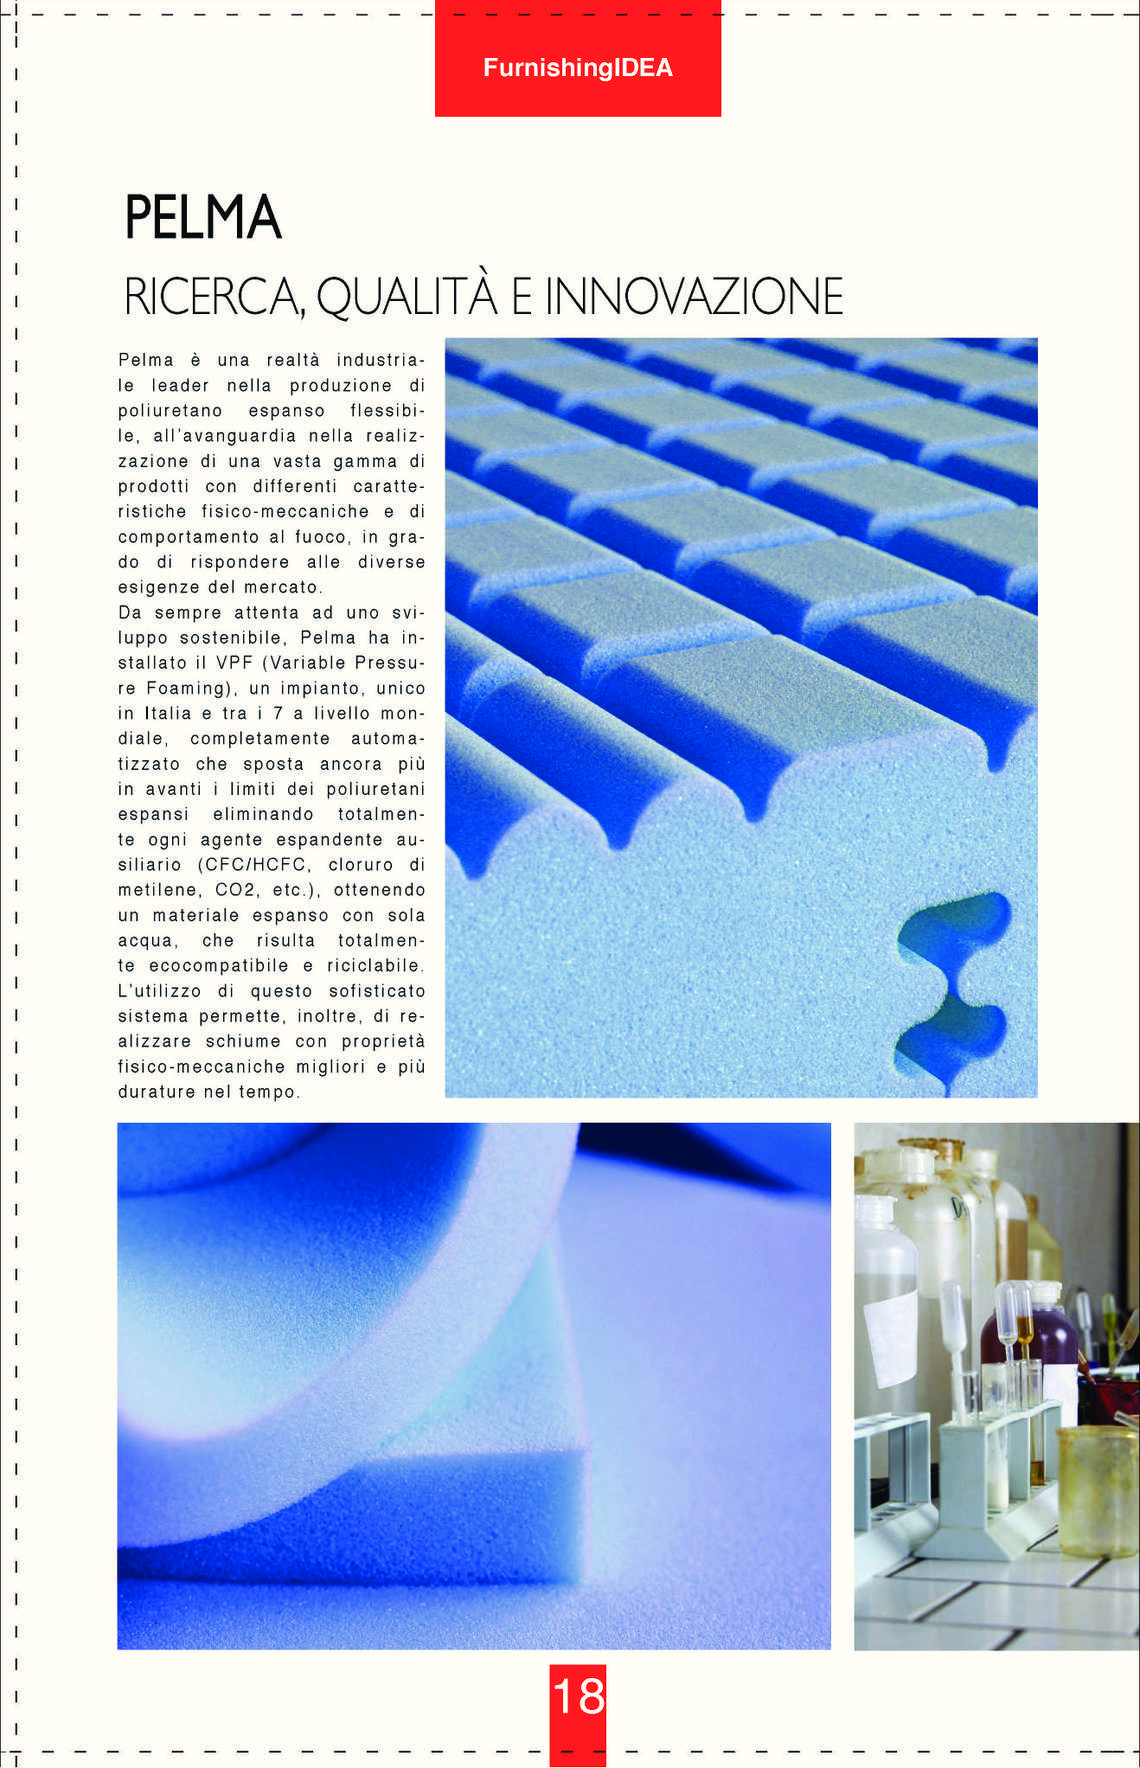 furnishing-idea-journal--1-2018_journal_9_017.jpg